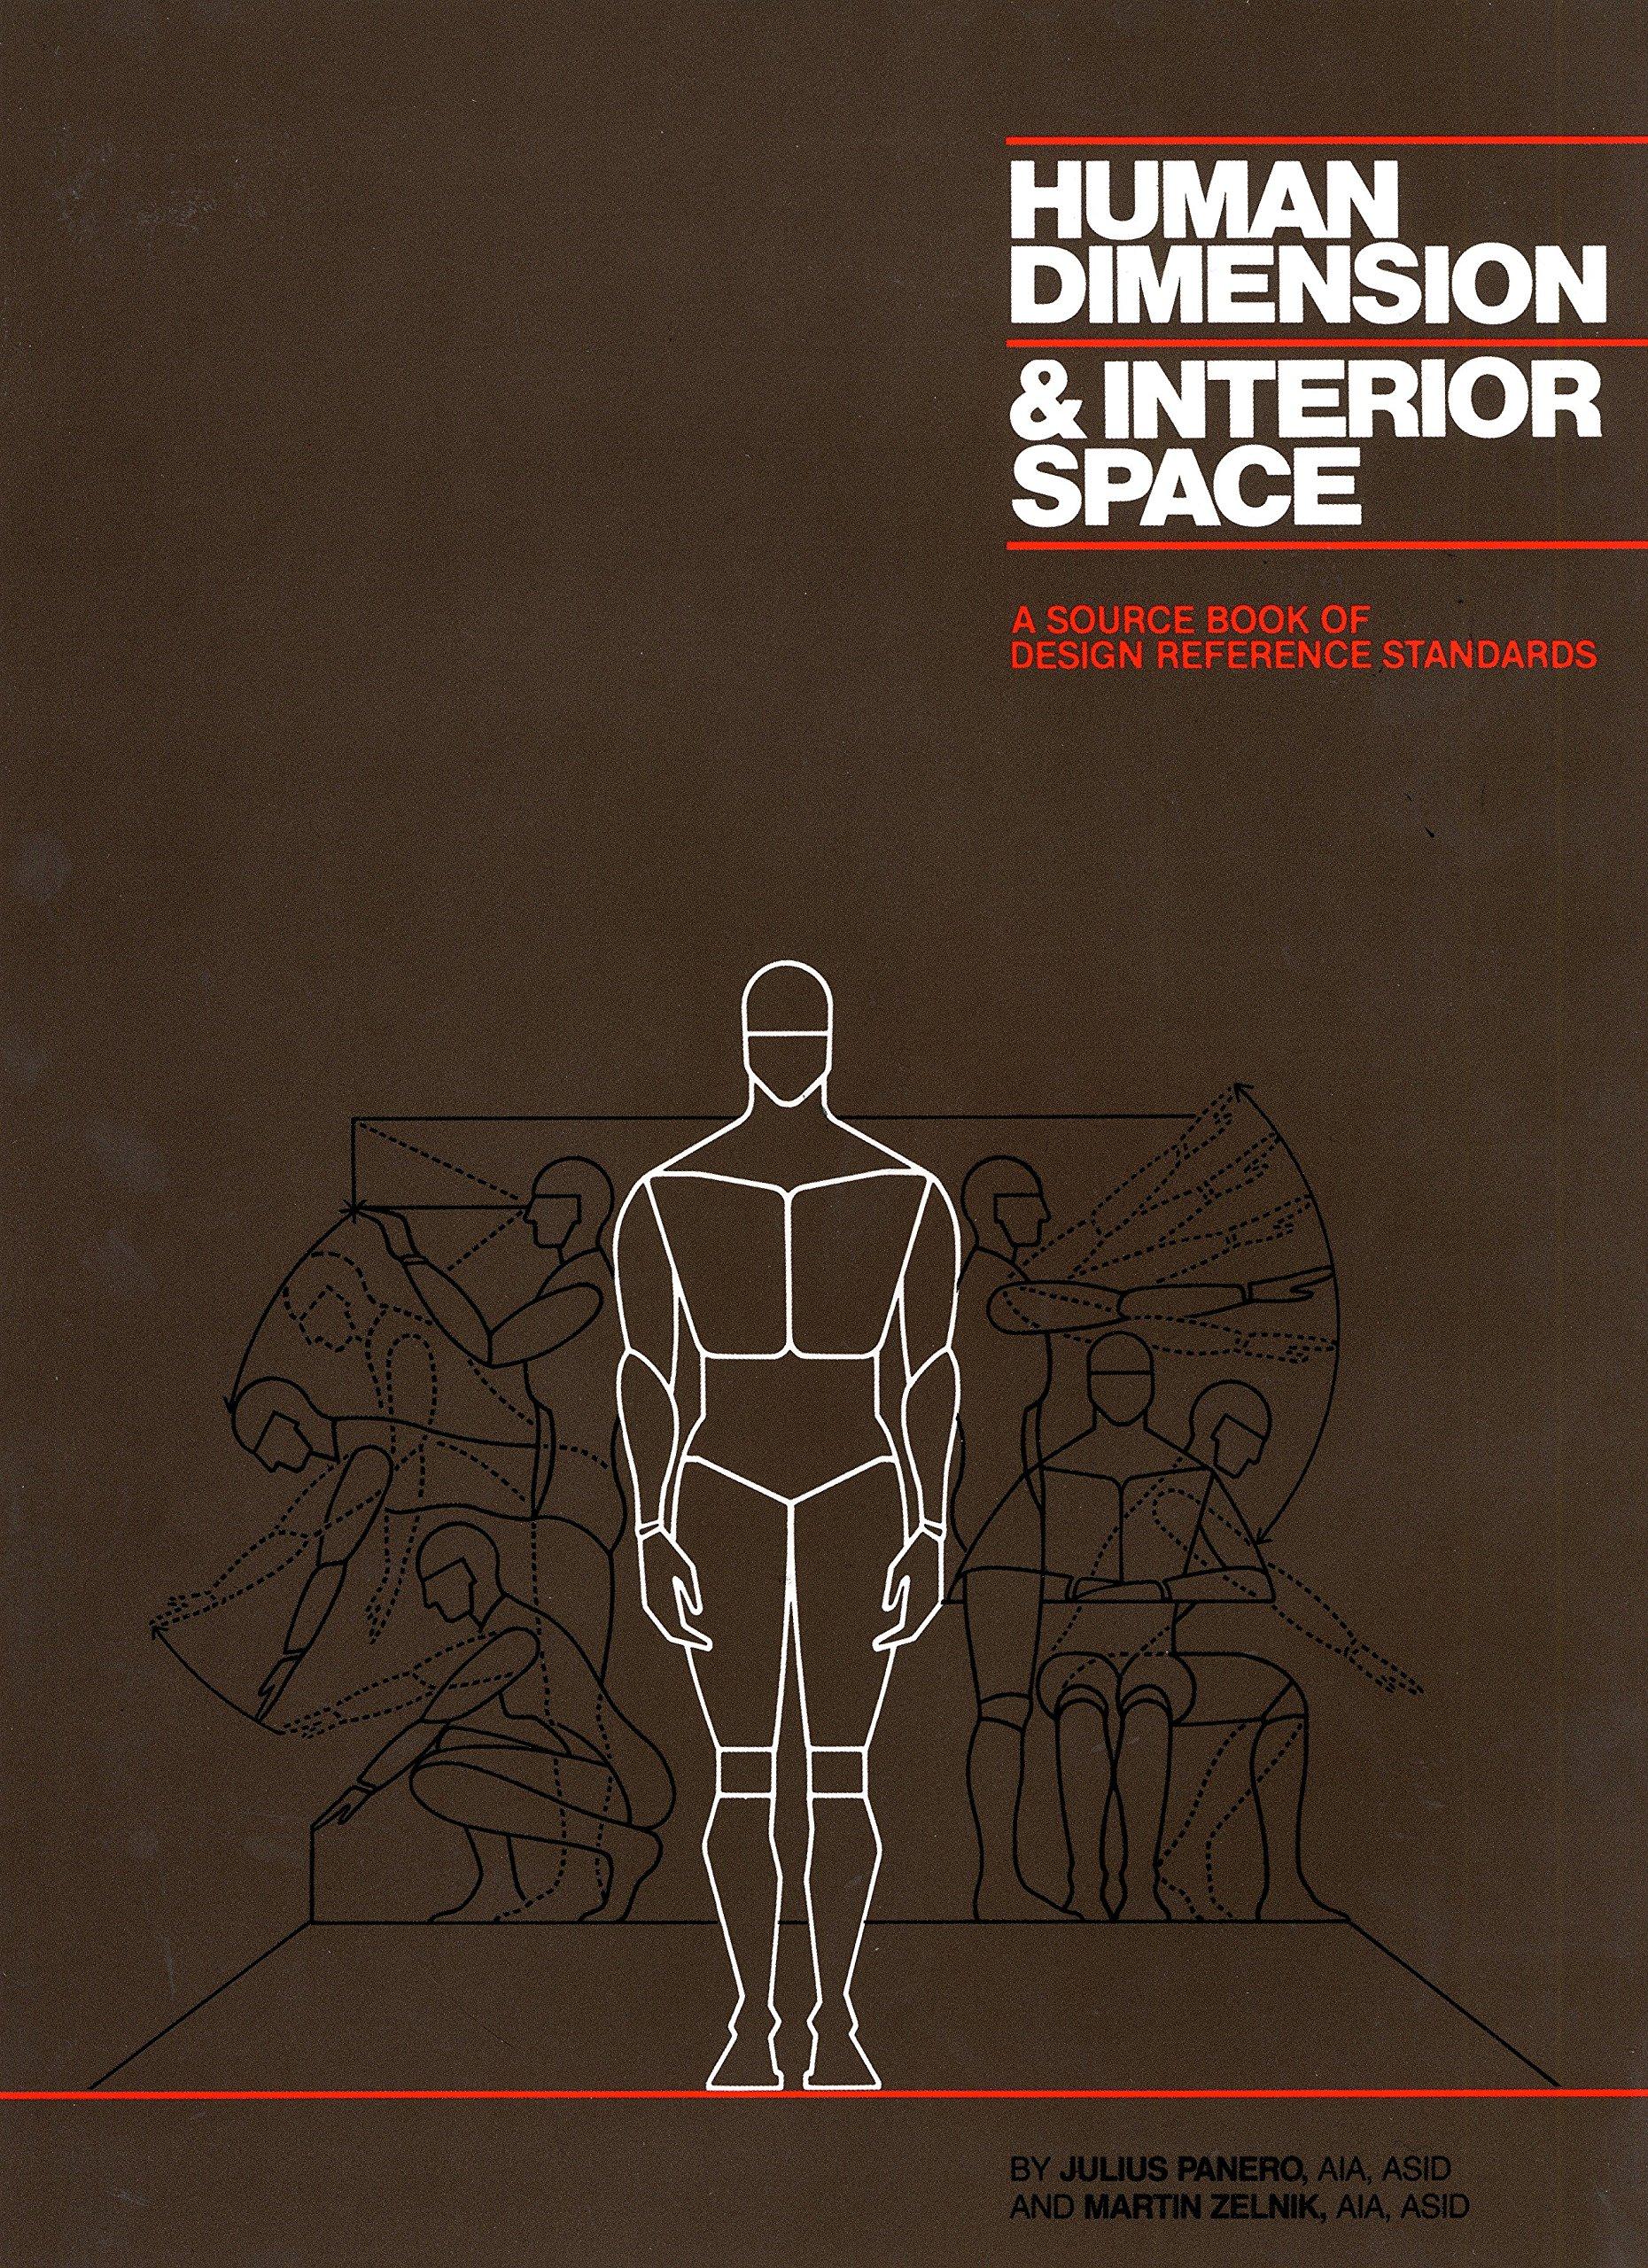 Human Dimension And Interior Space: Amazon.es: Julius Panero, Martin Zelnik: Libros en idiomas extranjeros